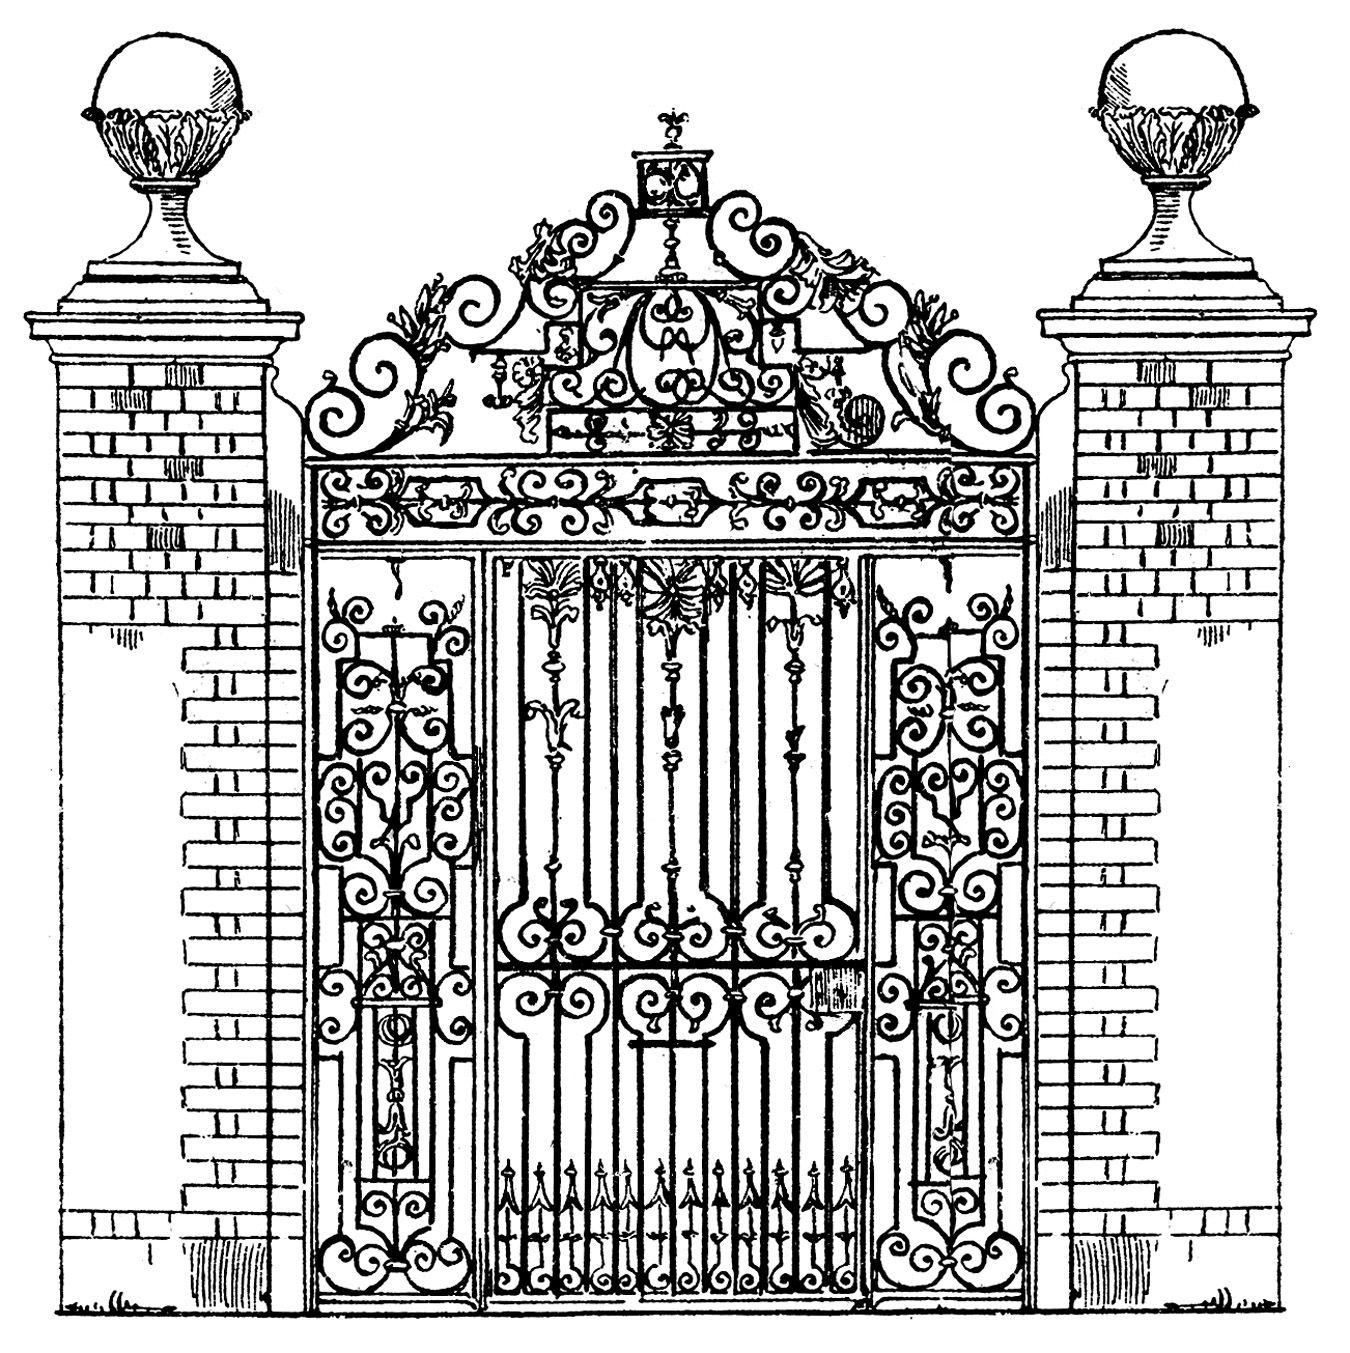 Vintage Clip Art Ornate Iron Gate Scrolls Clip Art Vintage